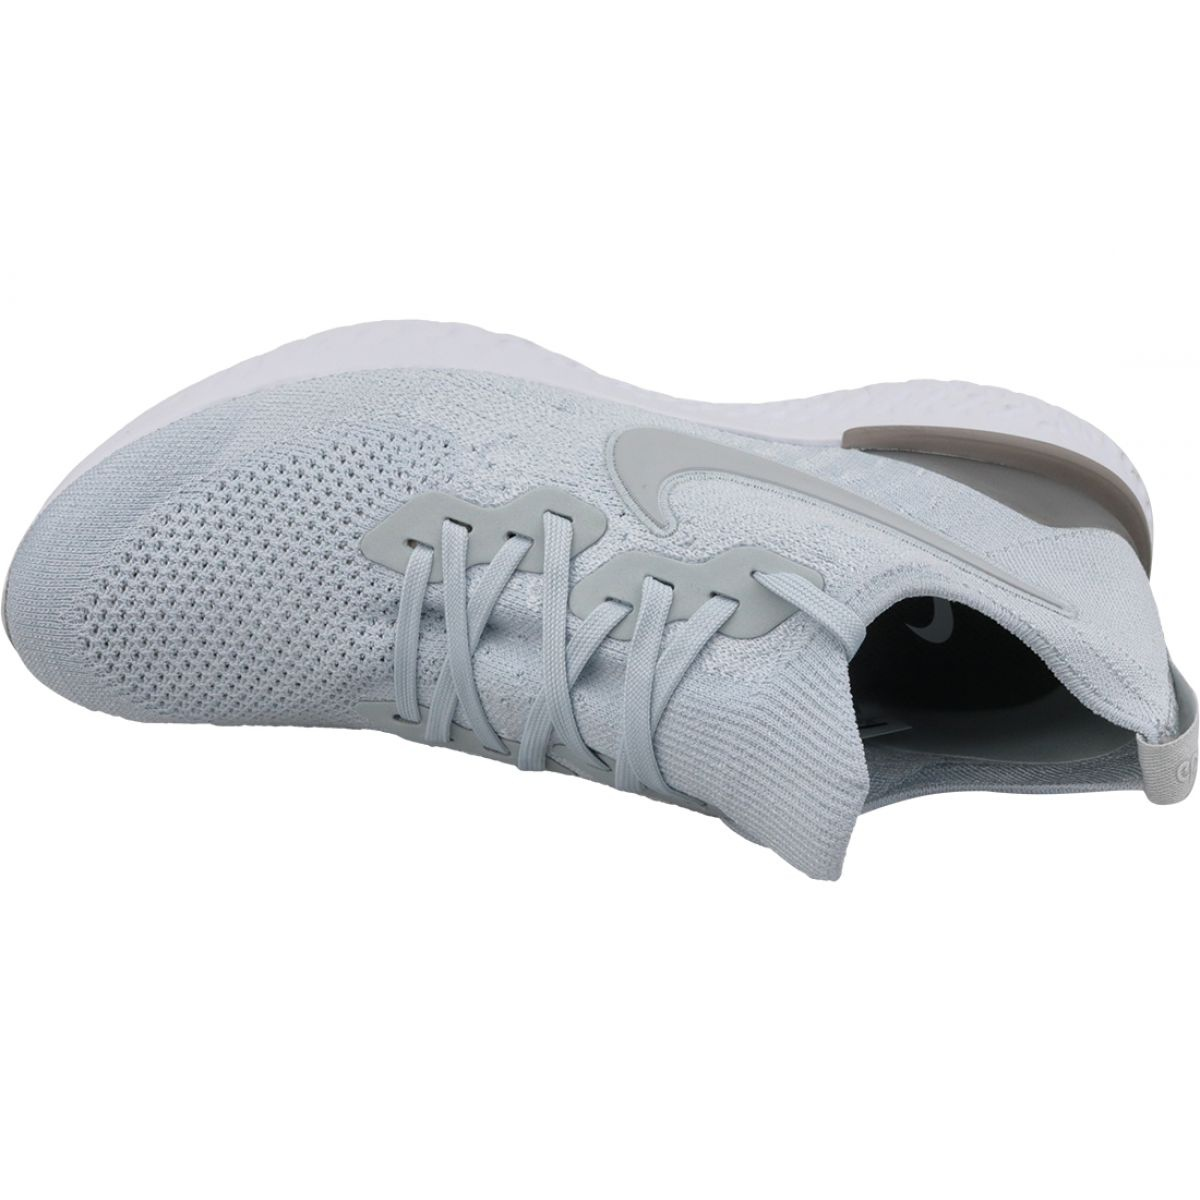 Cipők Nike Epic React Flyknit 2 M BQ8928 004 fehér